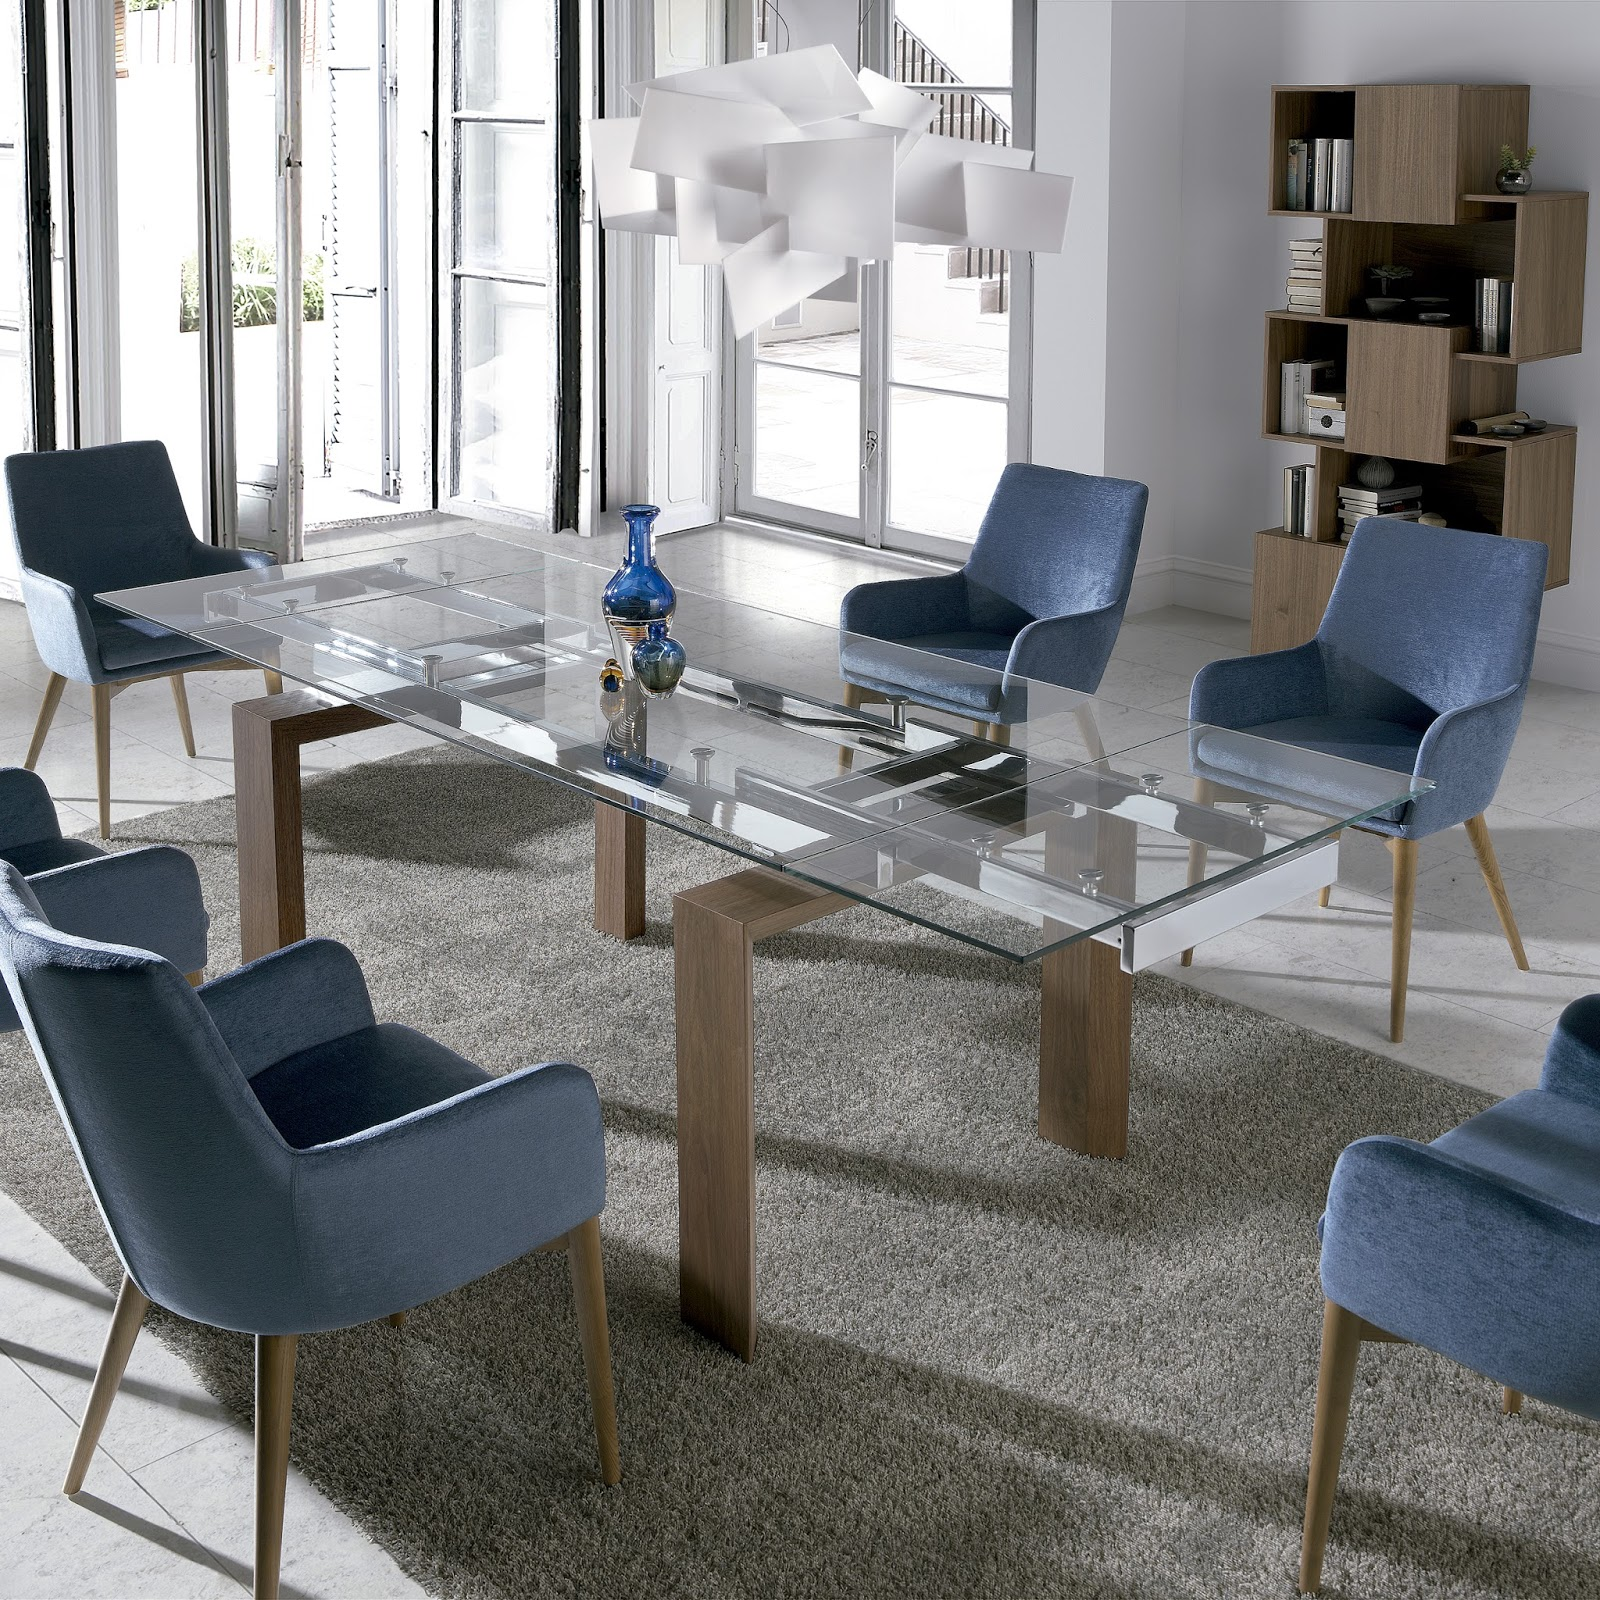 Mesas de comedor mesas de comedor extensibles de cristal for Comedor de cristal